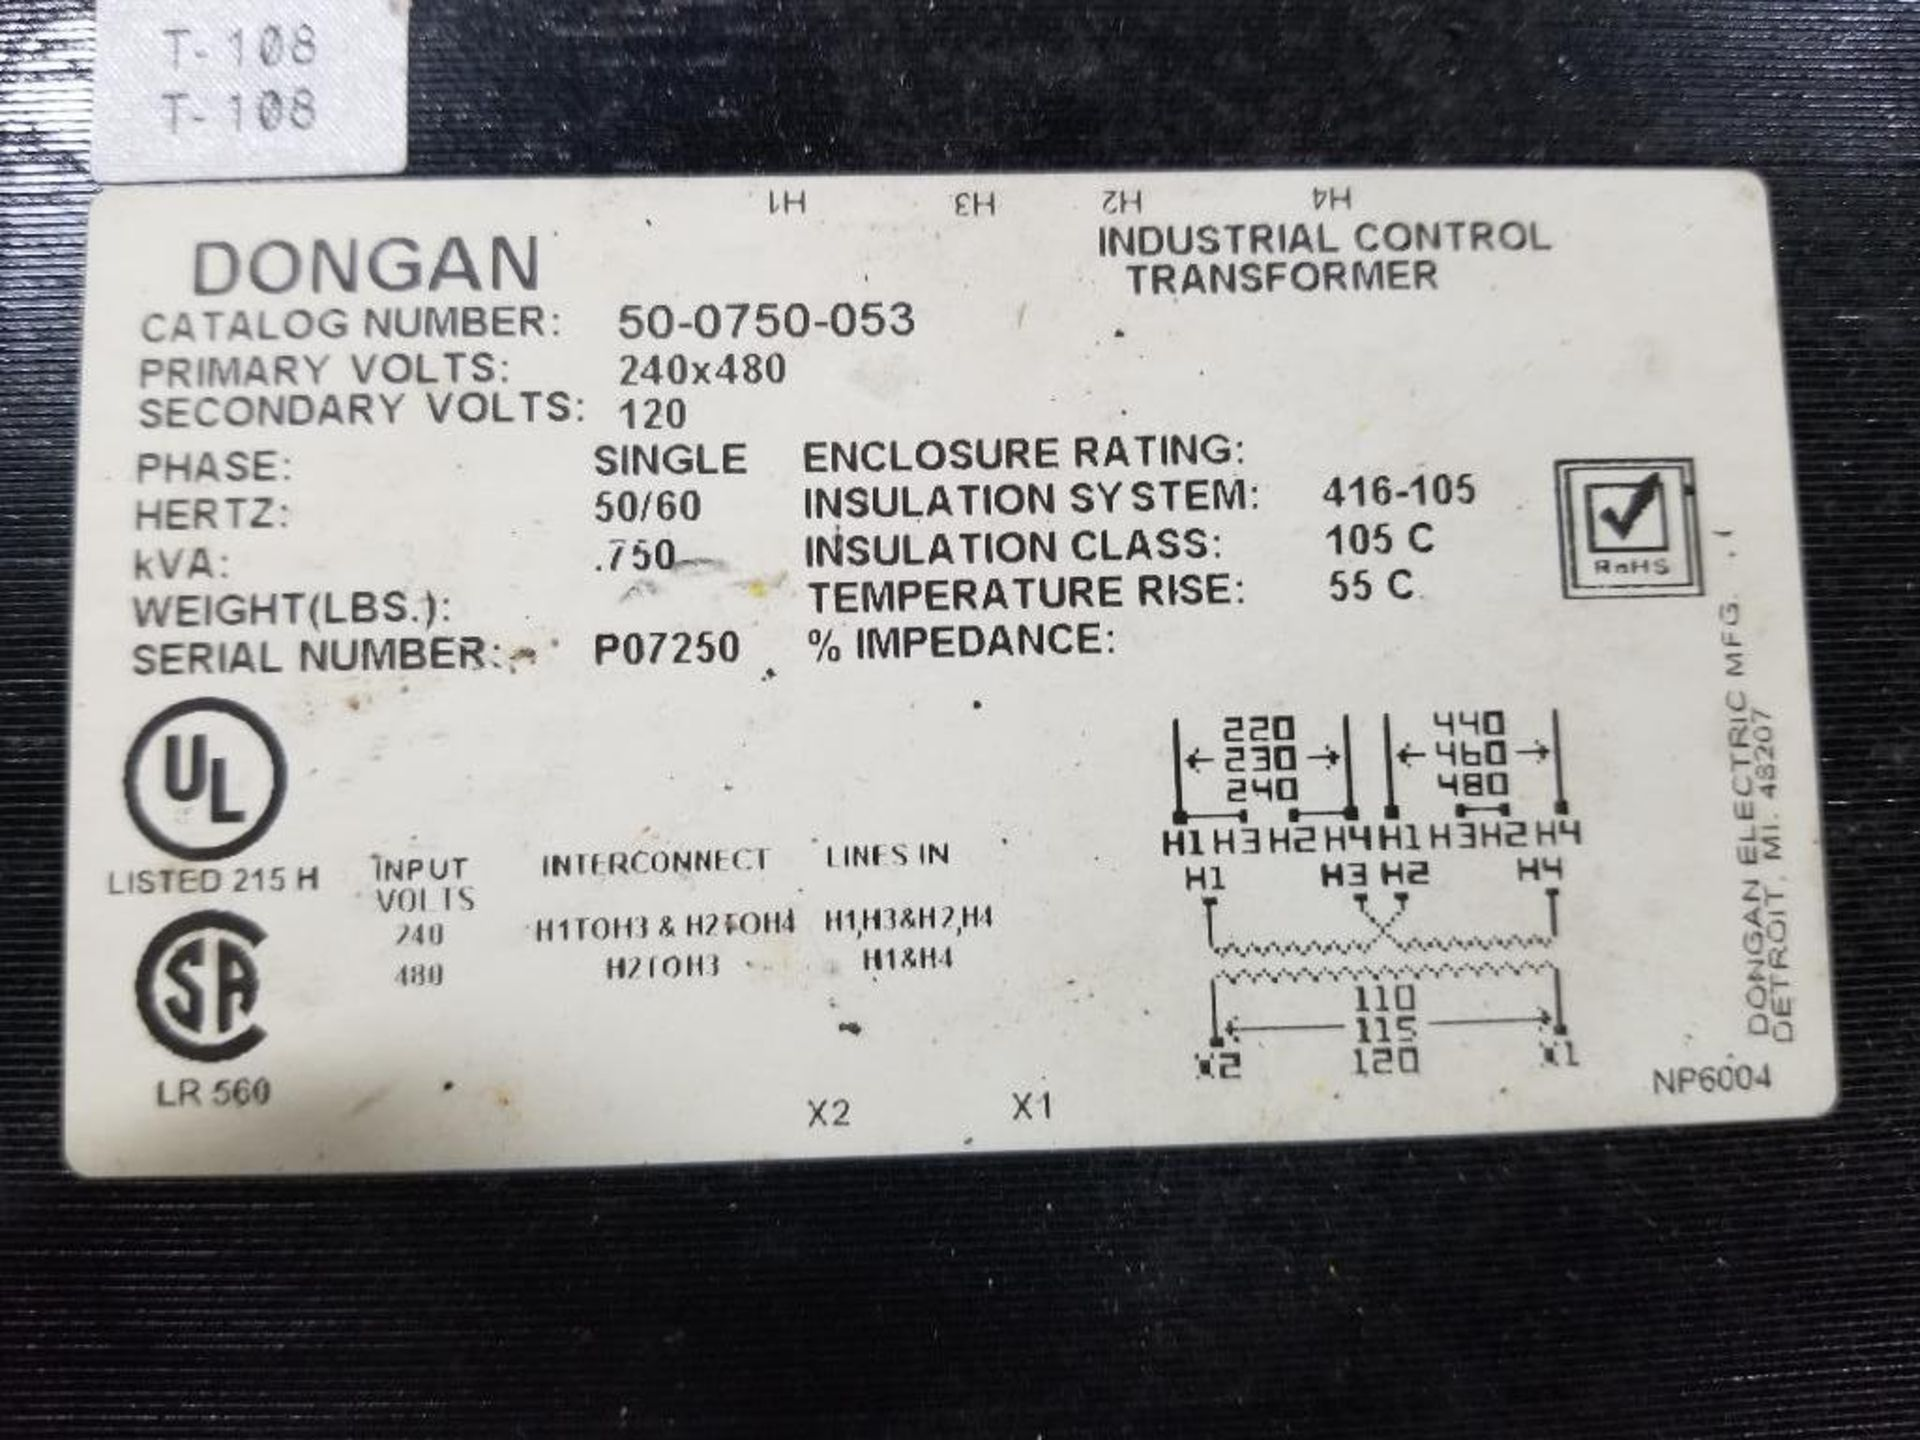 Dongan 50-0750-053 industrial control transformer. - Image 2 of 2